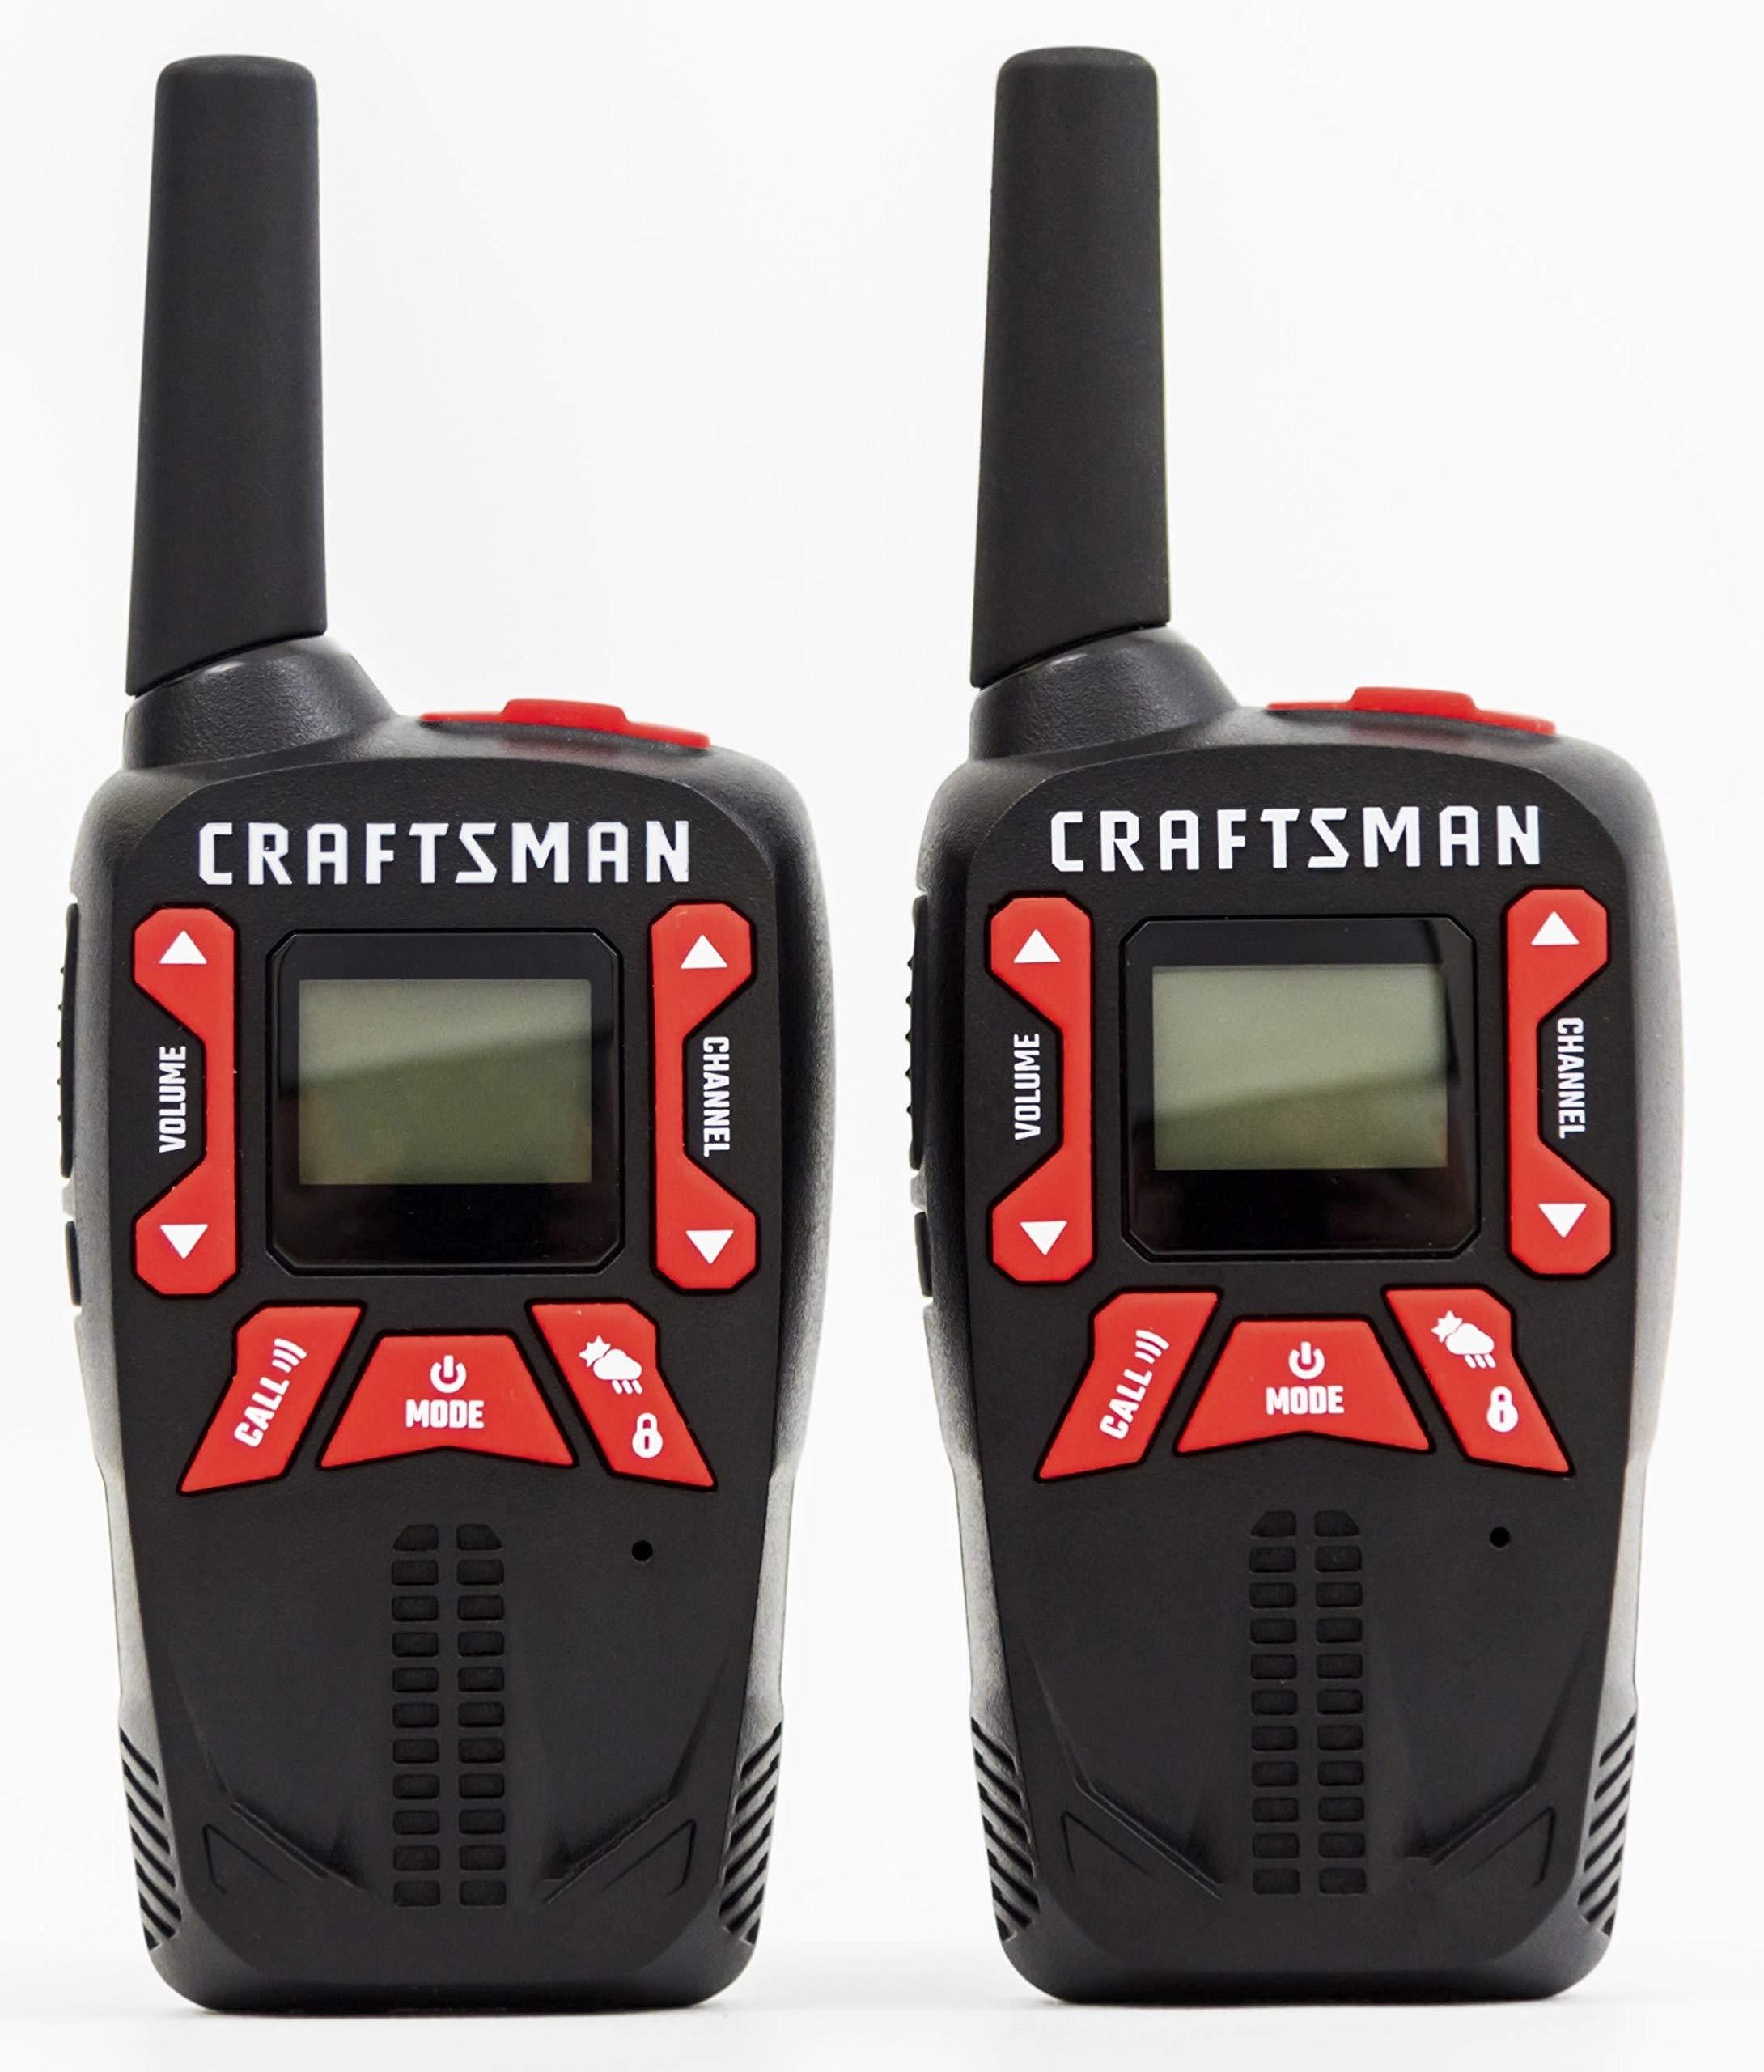 Craftsman CMXZRAZF333 Walkie Talkies Two-Way Business Radios (Pair) by Craftsman